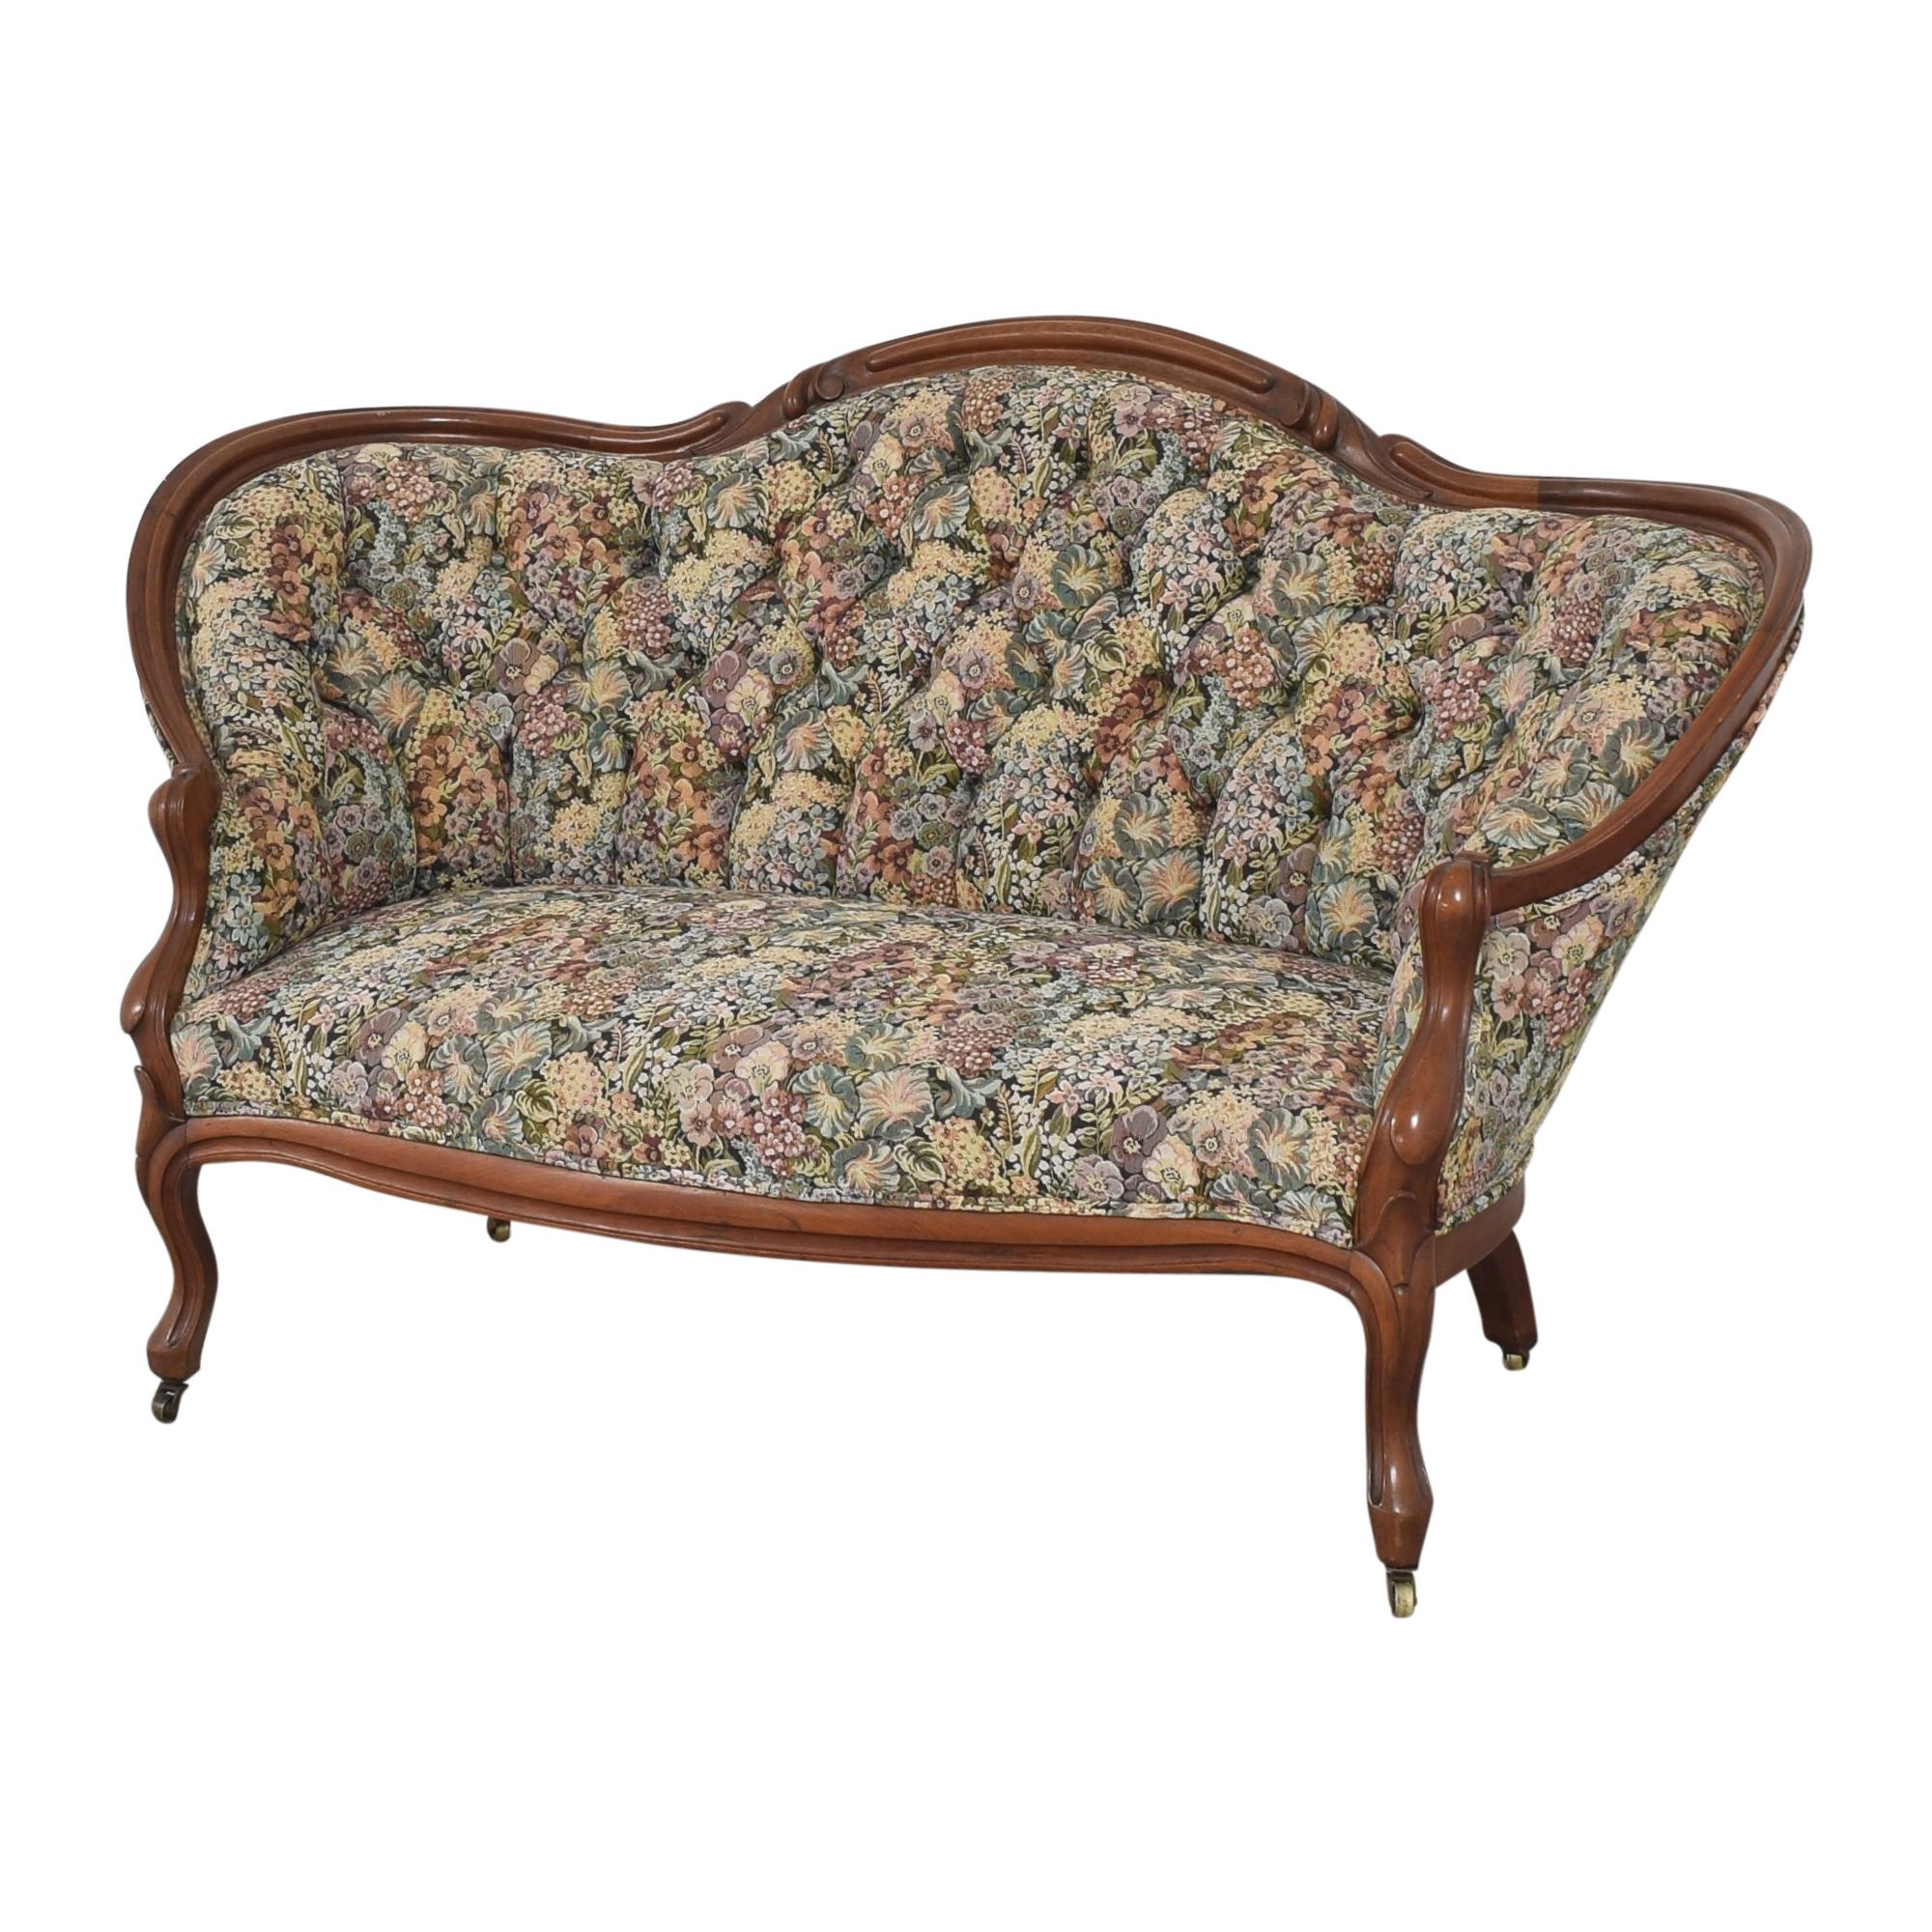 buy  Vintage Floral Tufted Settee online